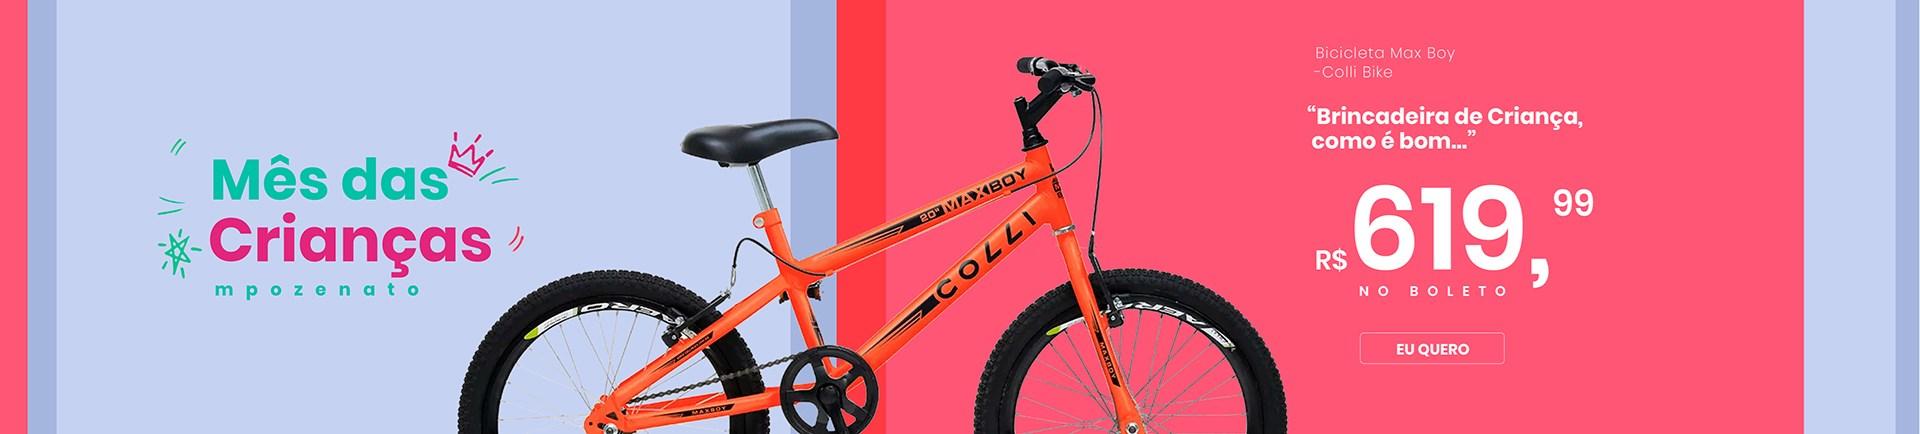 Bicicleta Max Boy - Desk